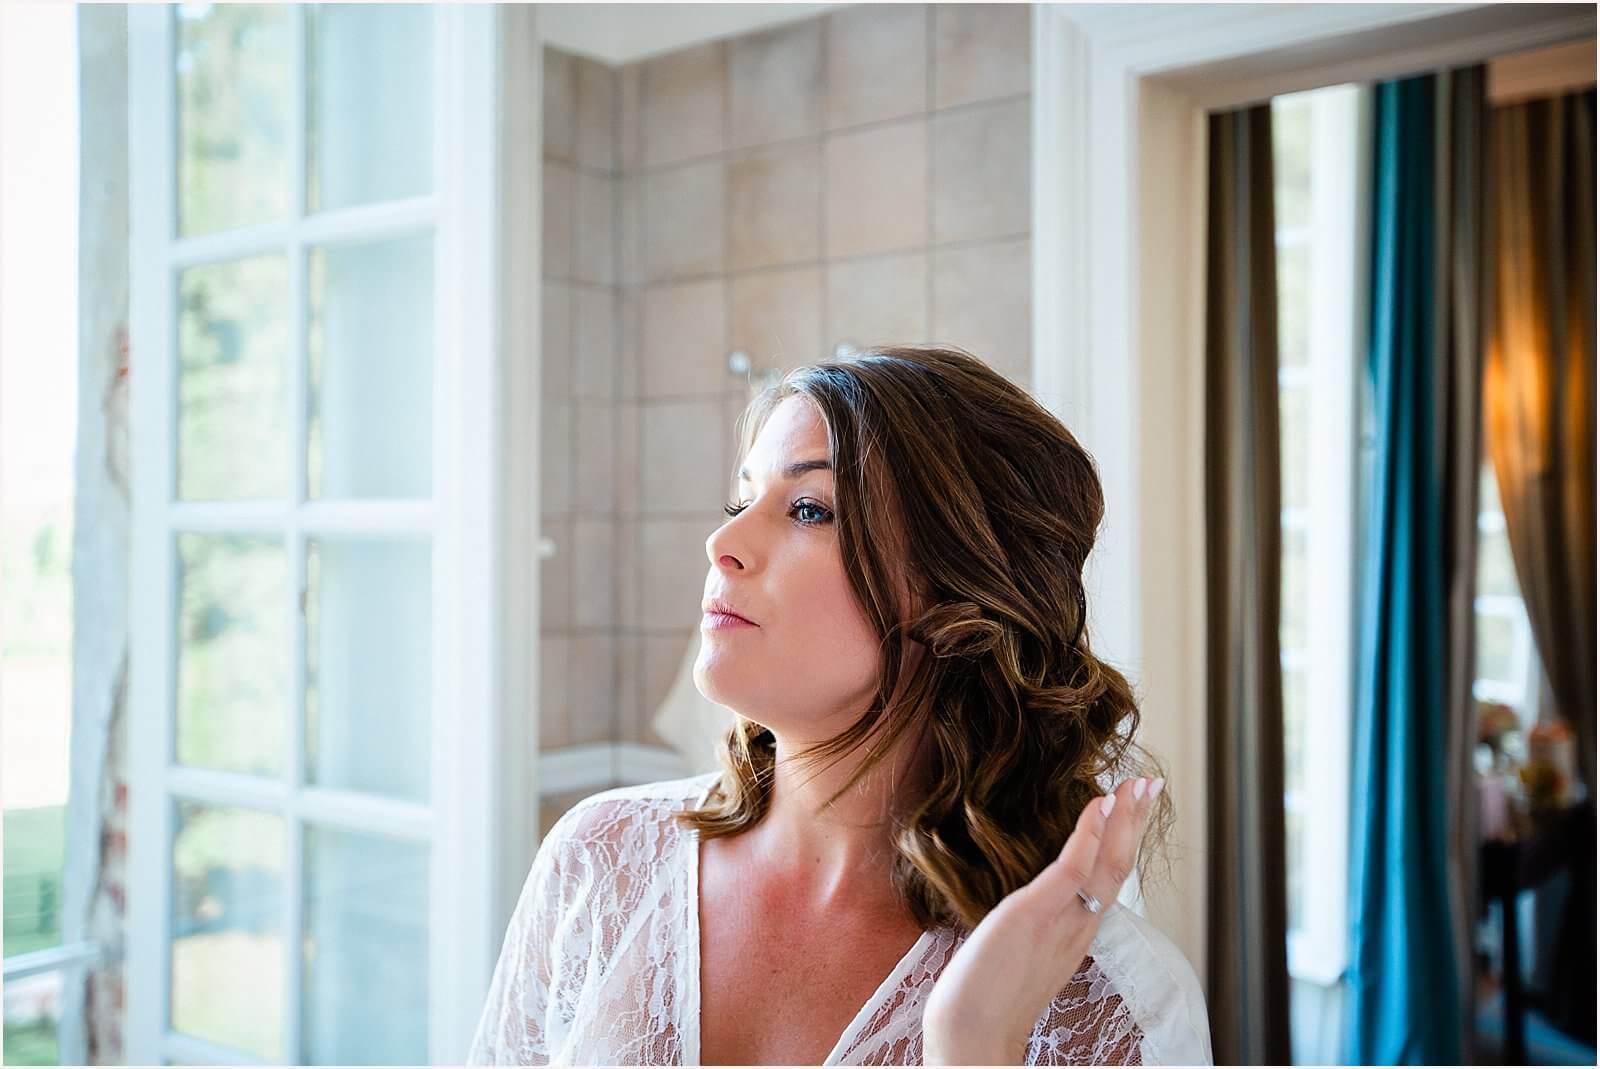 Chateau de Courtomer Wedding | Chantel & Evan 9